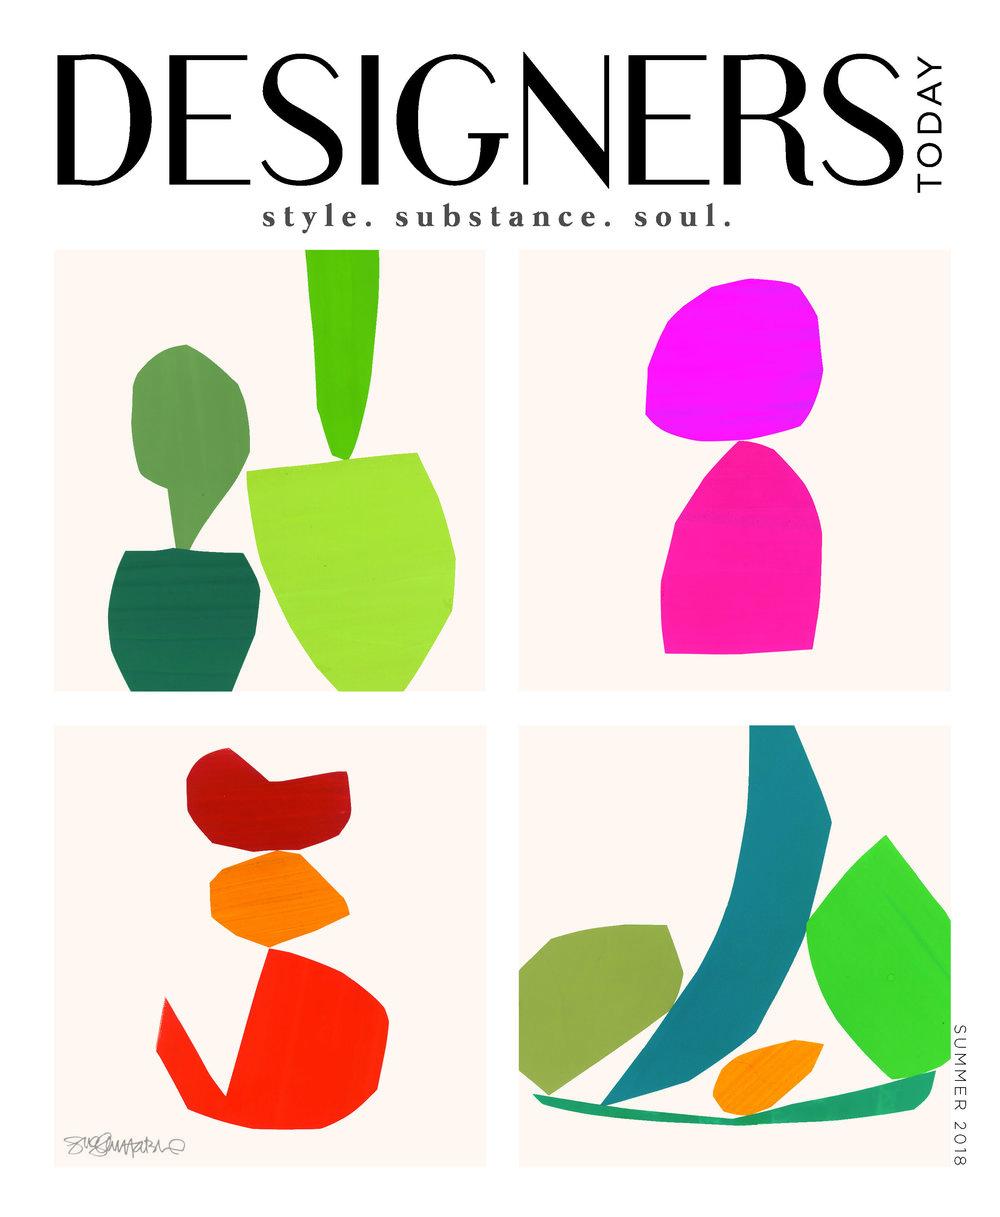 DesignersToday